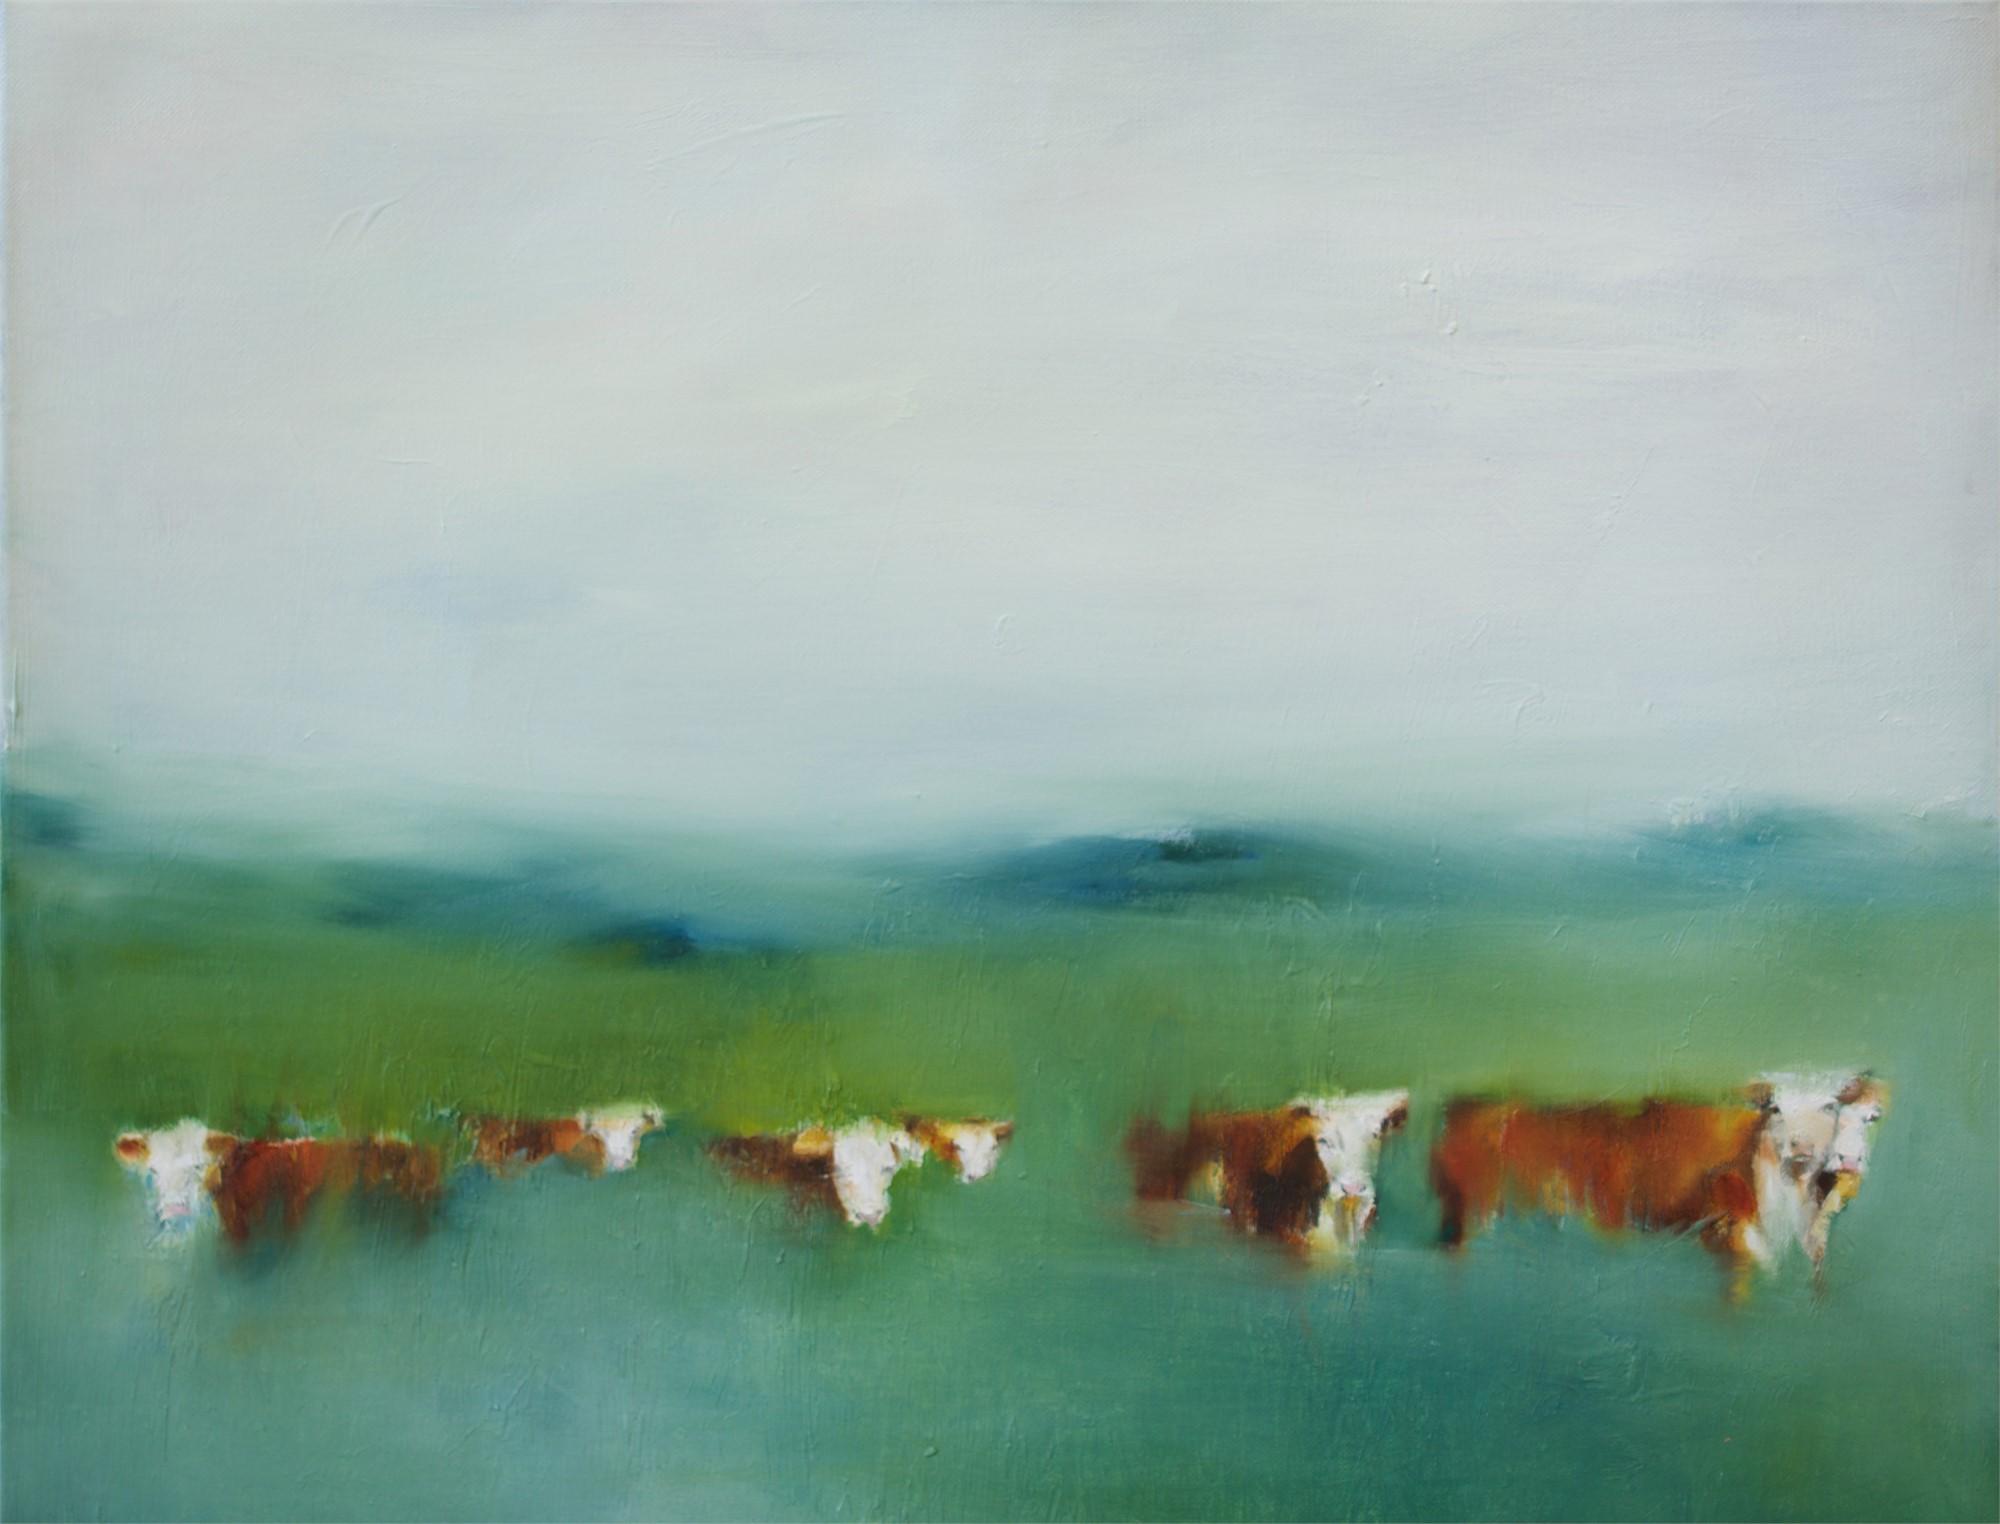 7 Hiding Cows by Elsa Sroka